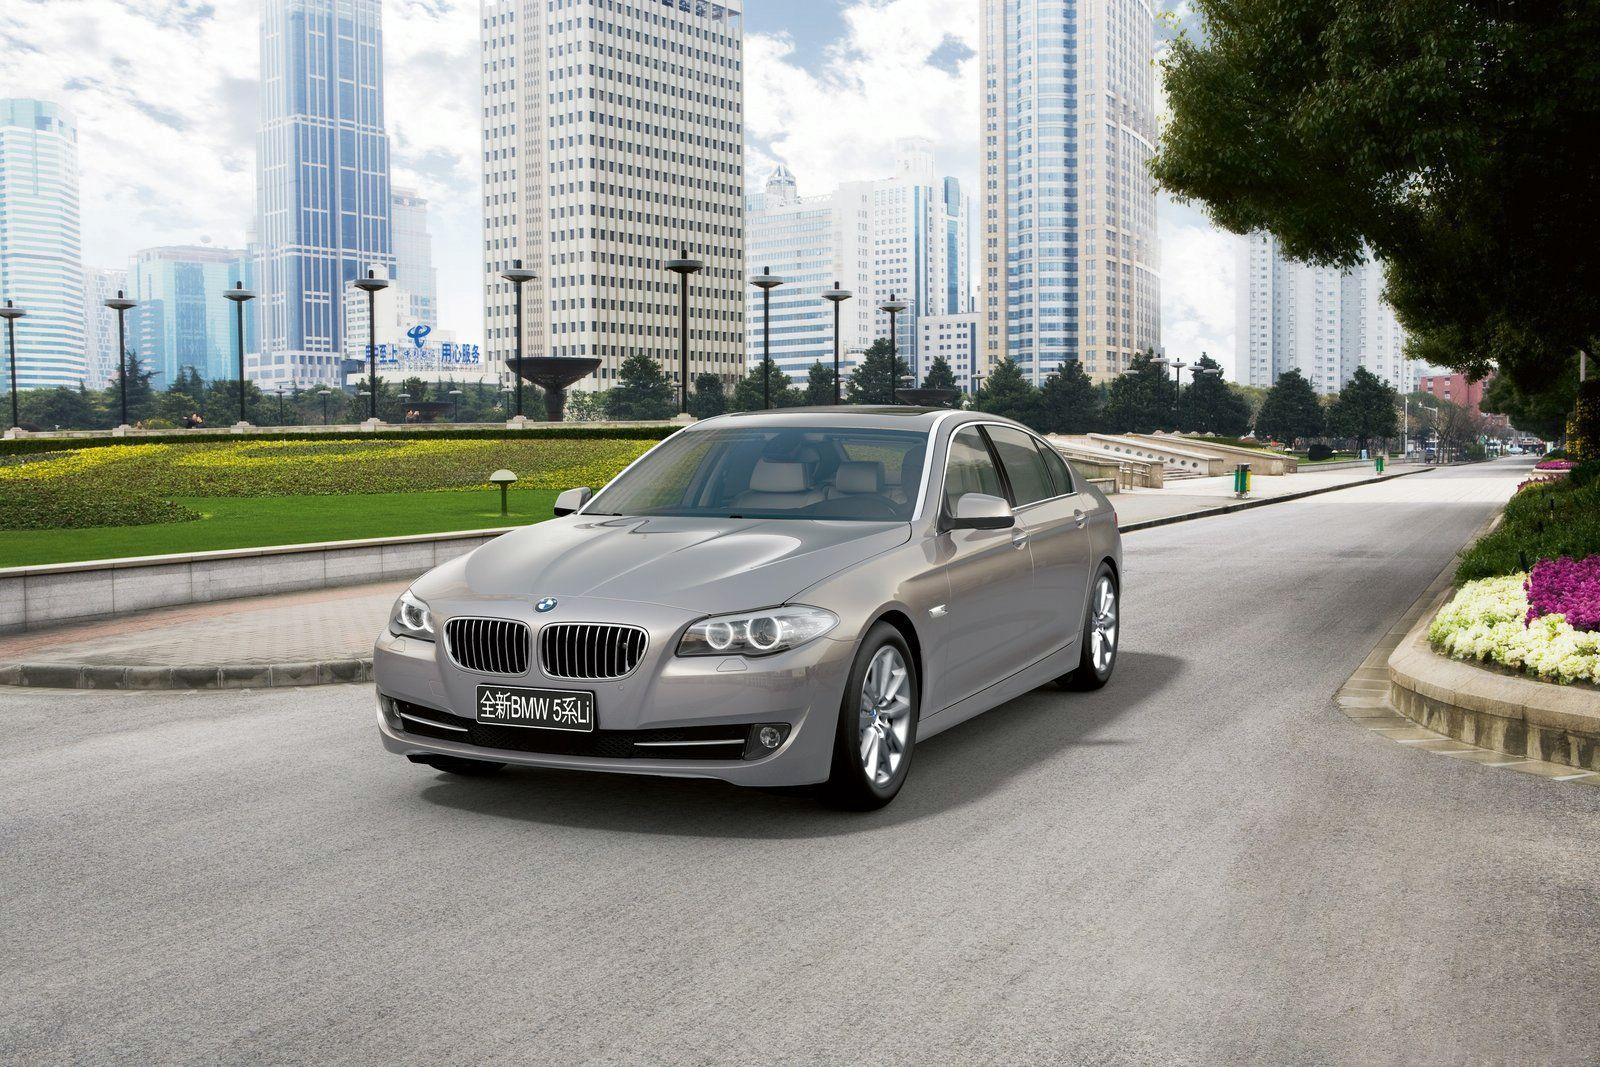 2011 BMW 5-Series Long Wheelbase Revealed w/Video